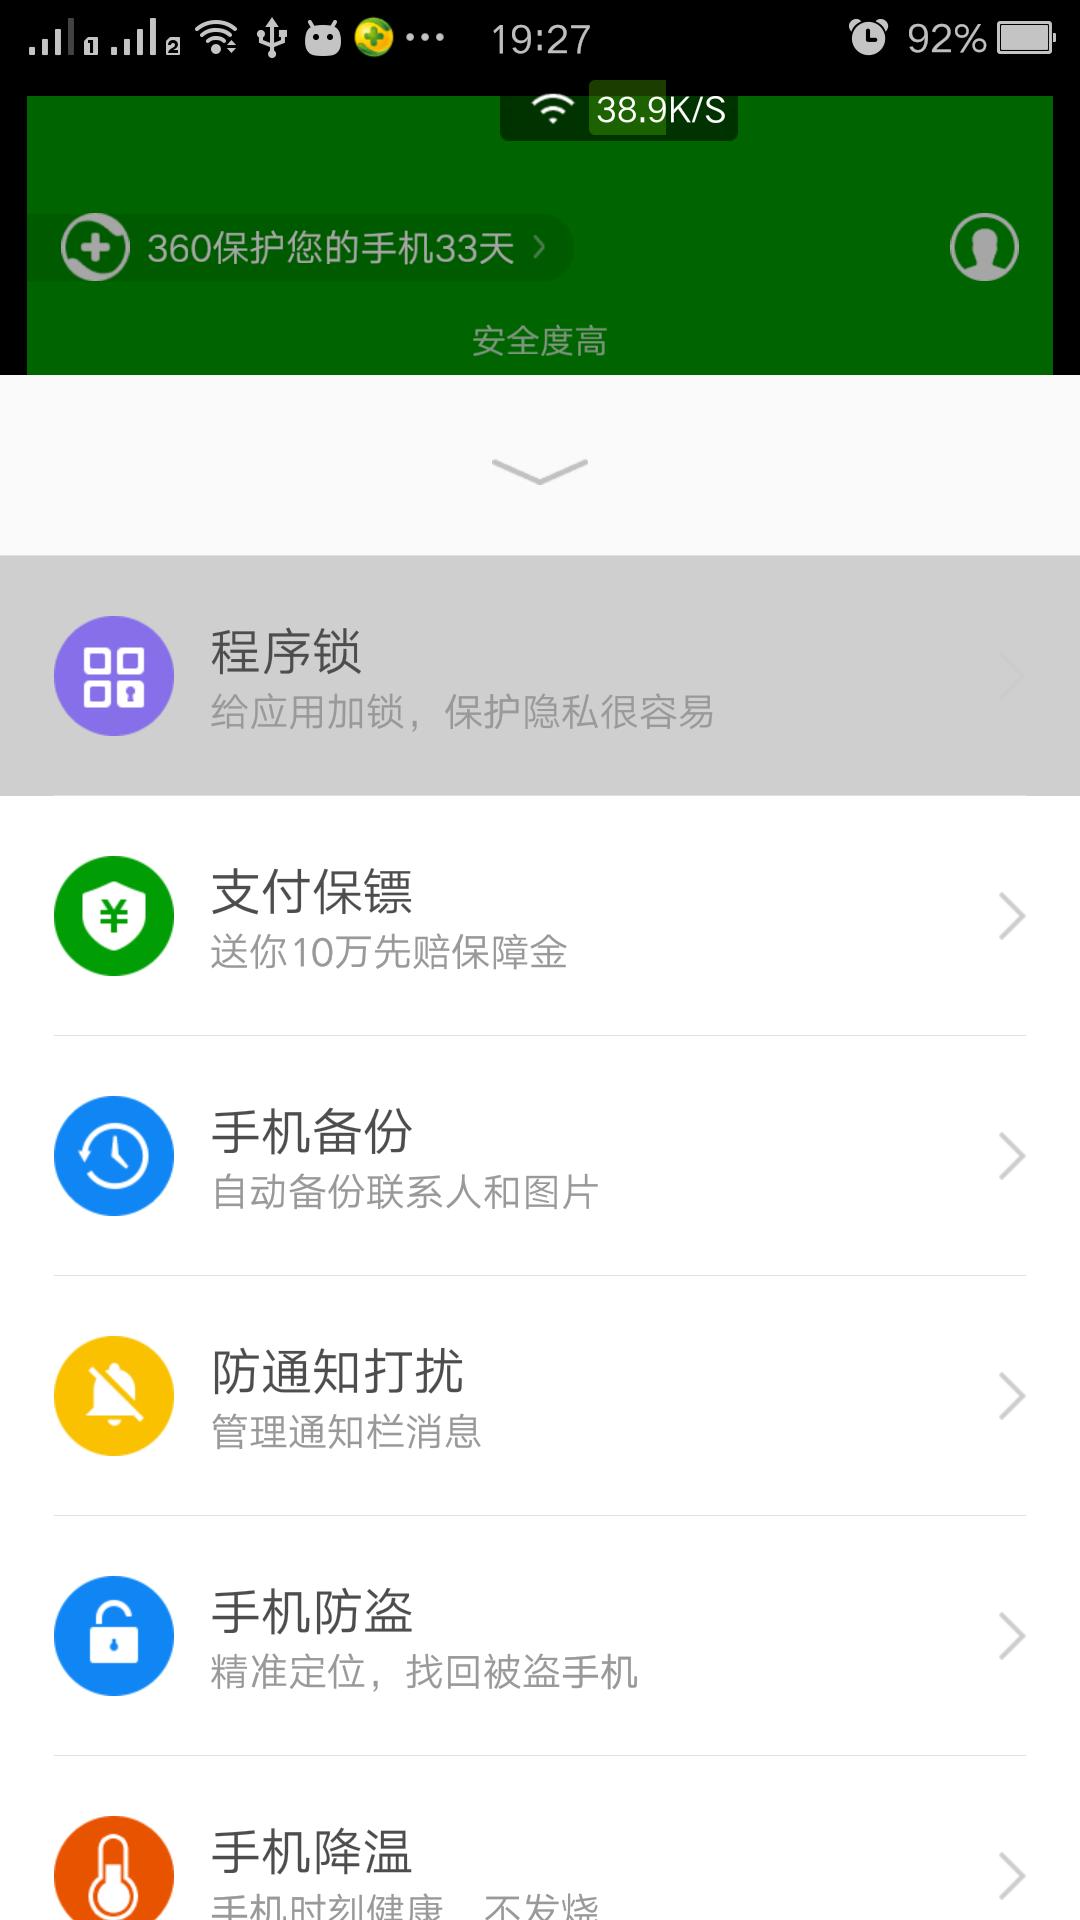 Screenshot_2015-12-22-19-27-00-163.png